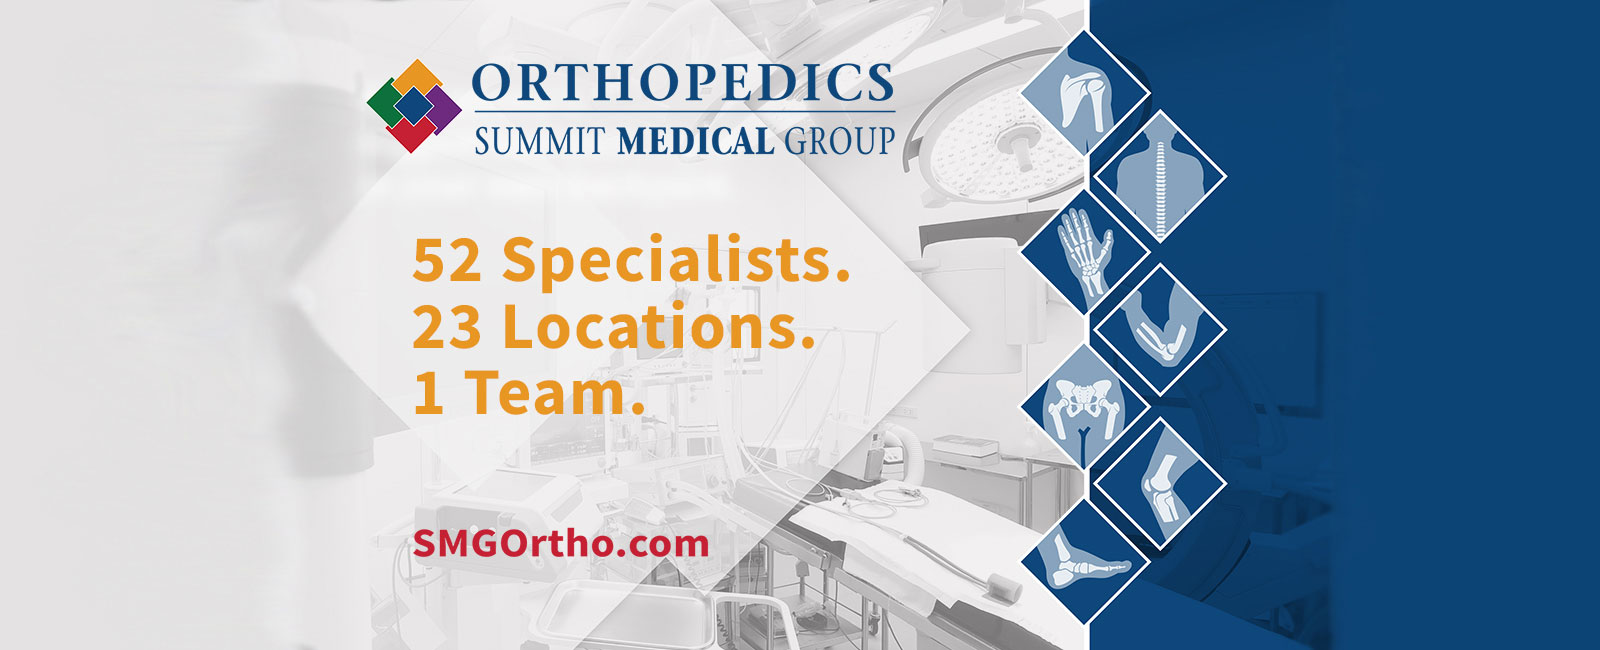 Orthopedics at Summit Medical Group: 52 specialists. 23 Locations. 1 team. SMGOrtho.com